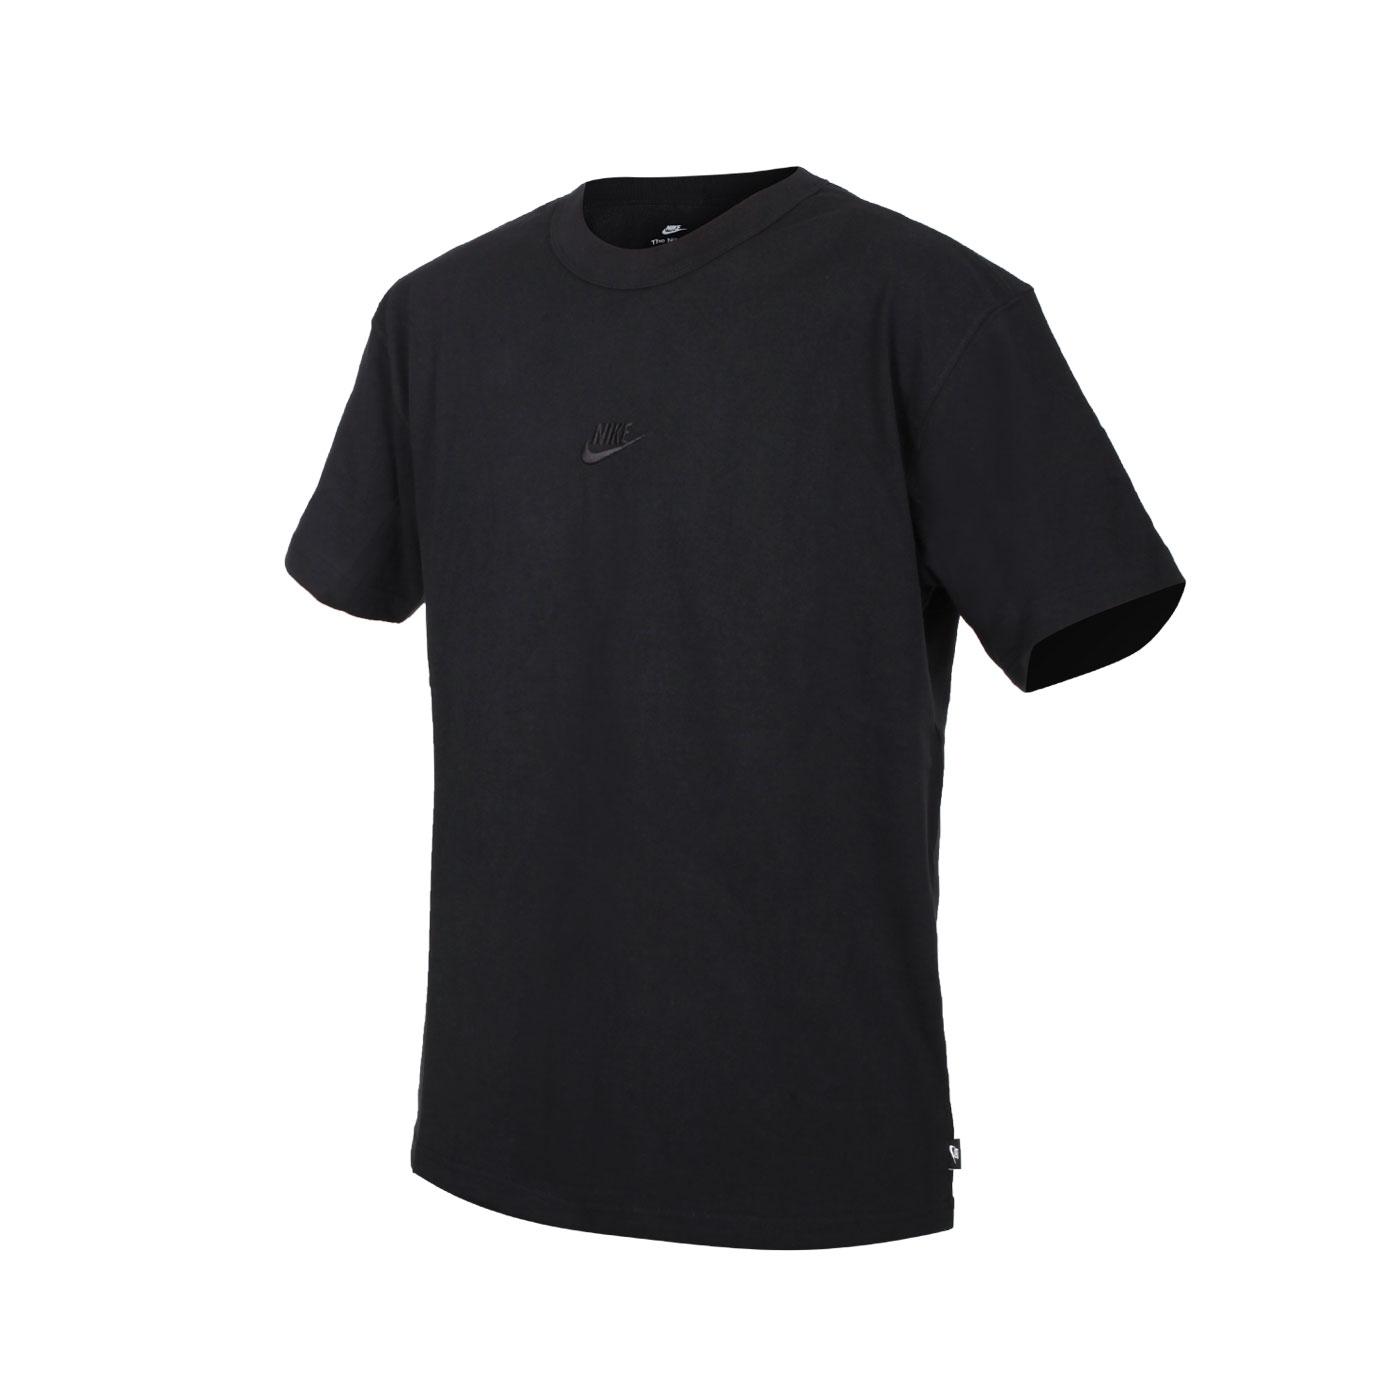 NIKE 男款短袖T恤 DB3194-010 - 黑